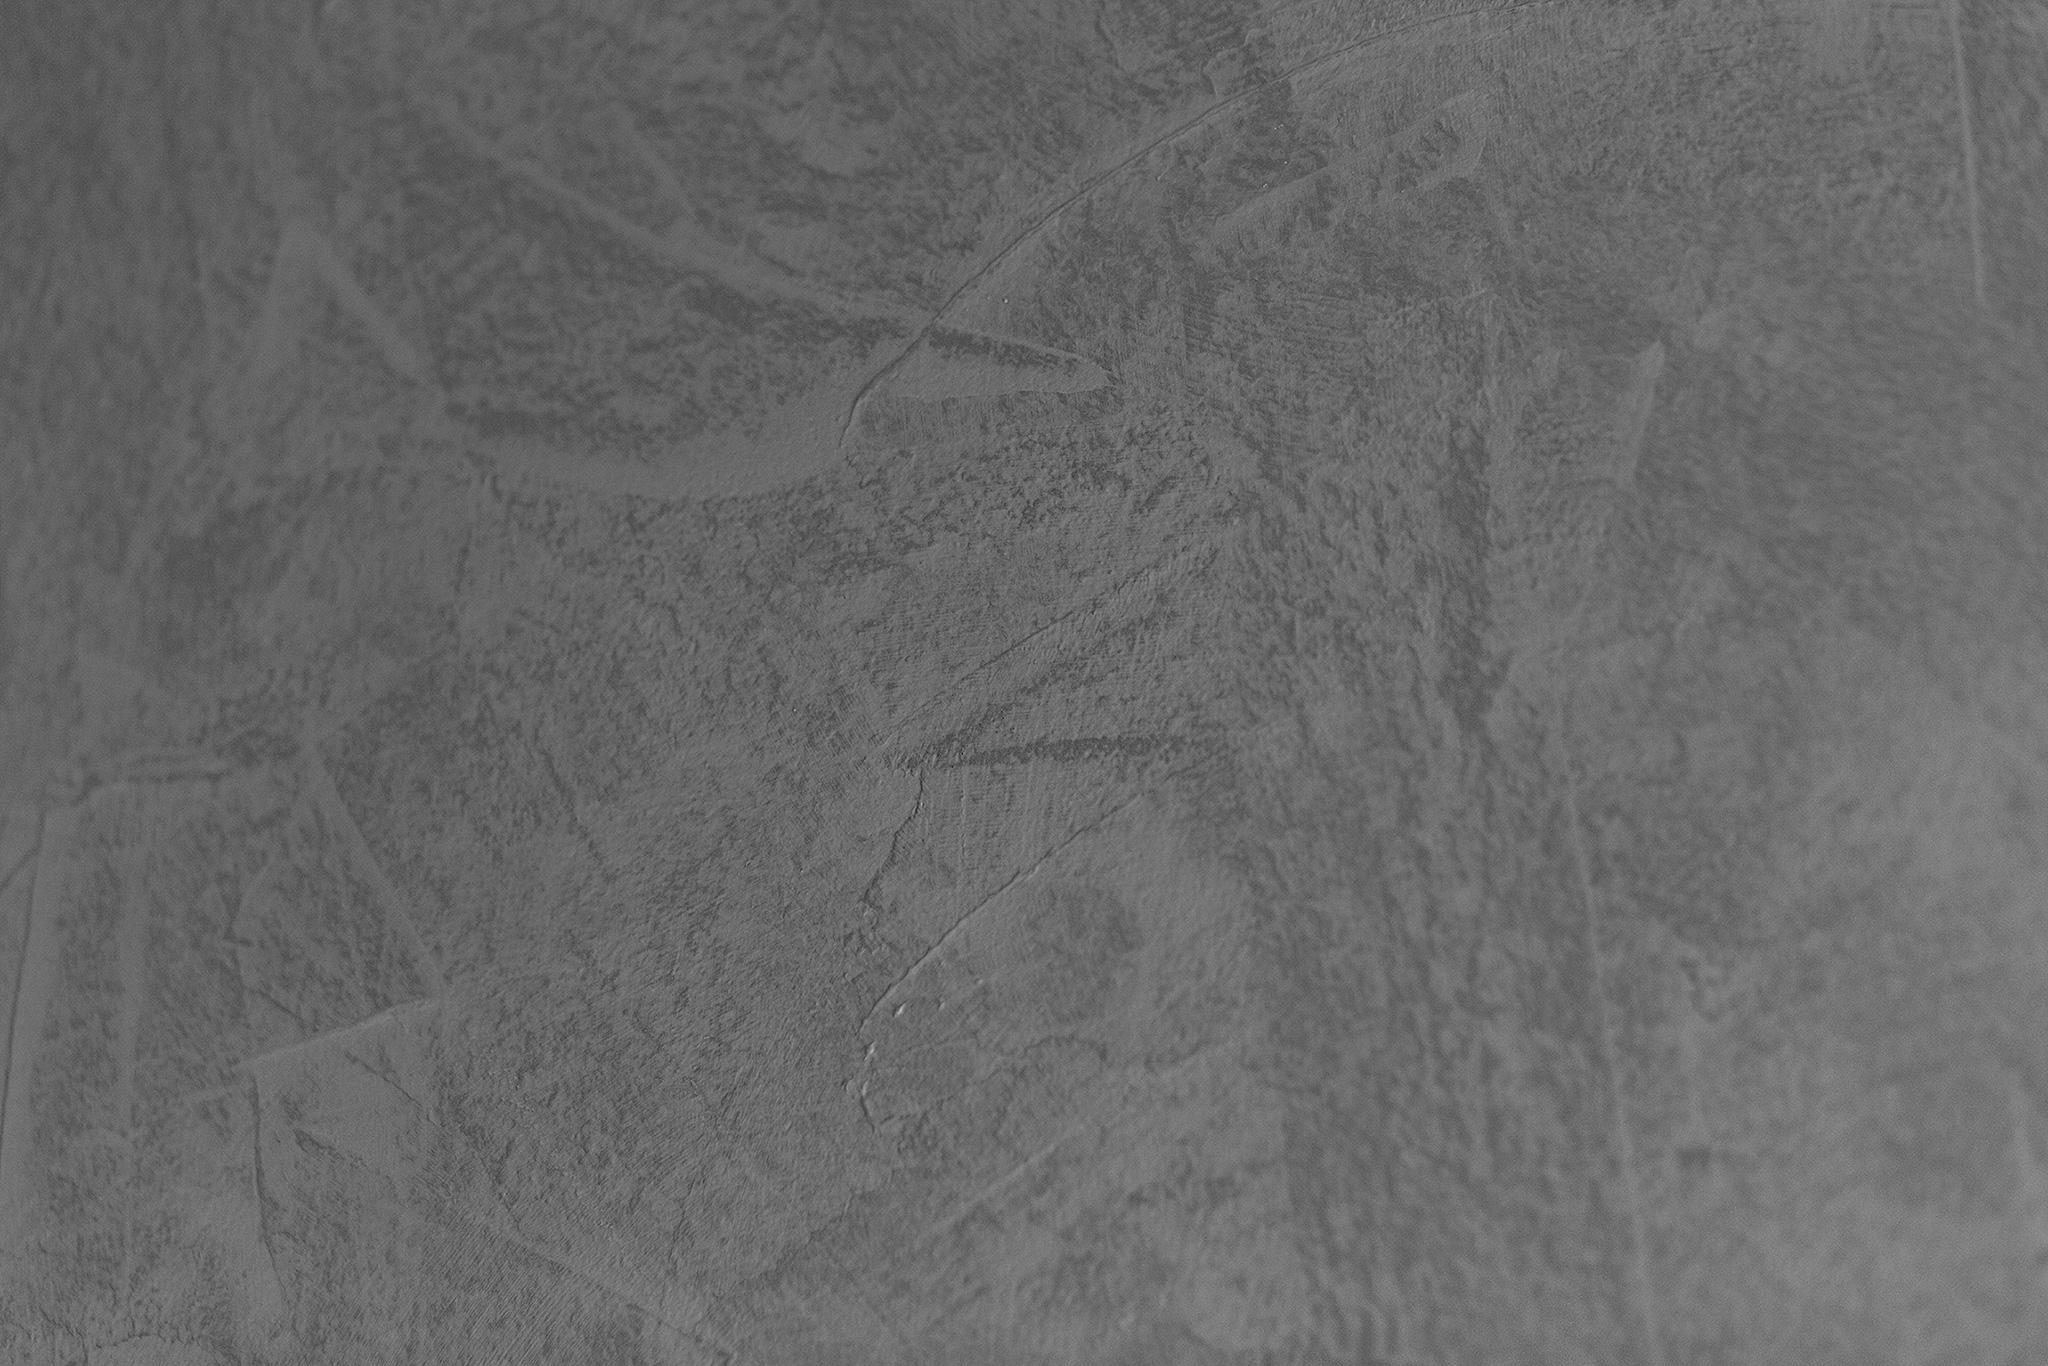 betonwand selber machen alpina beton optik erfahrungen diy concrete wall bezauberndenana 3. Black Bedroom Furniture Sets. Home Design Ideas